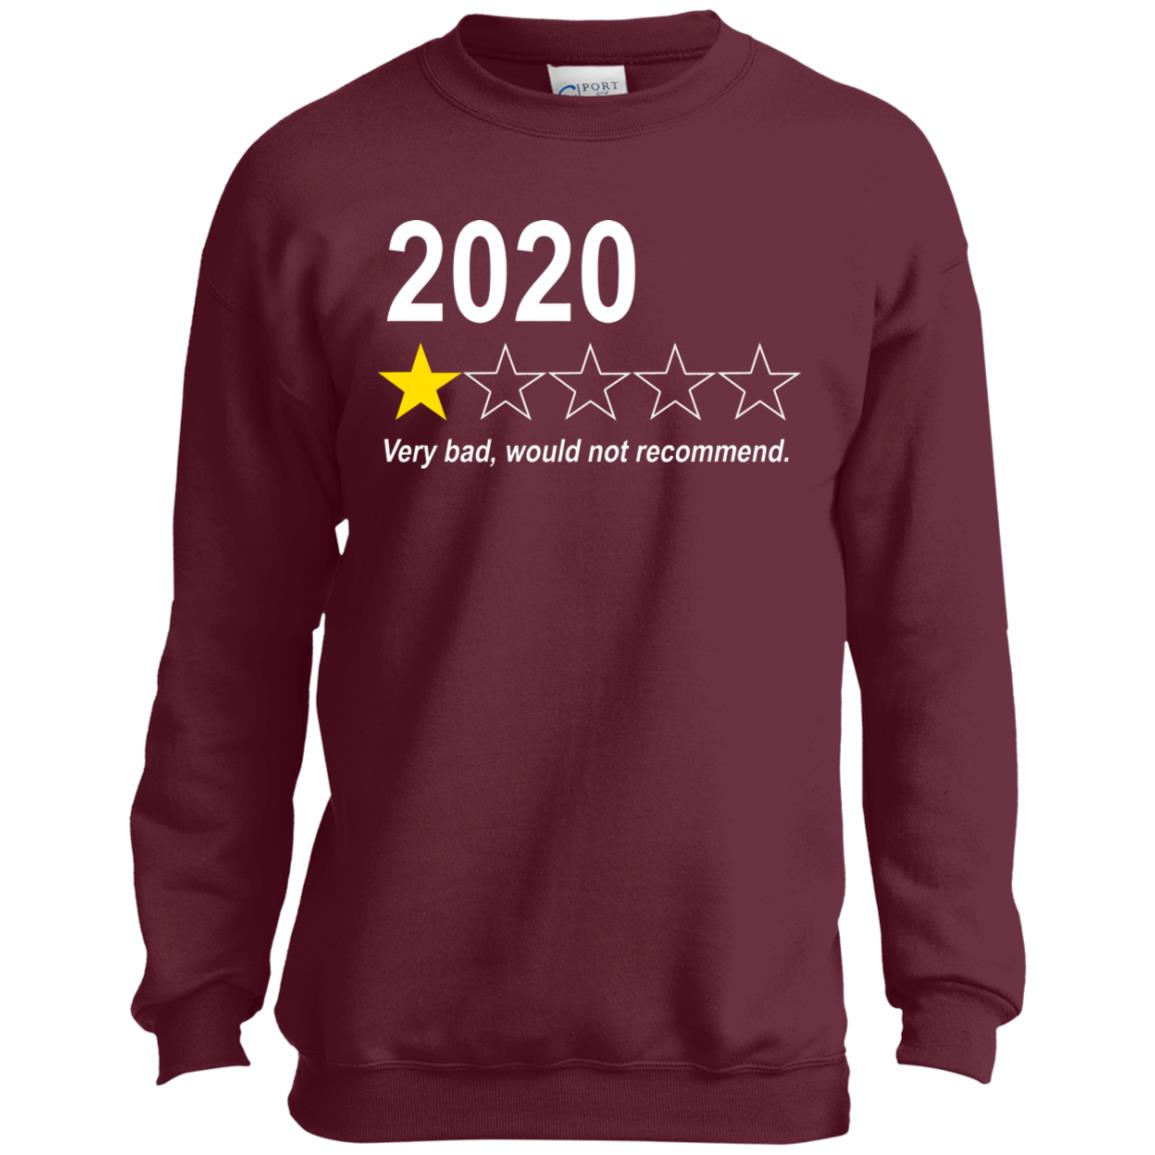 PC90Y Youth Crewneck Sweatshirt